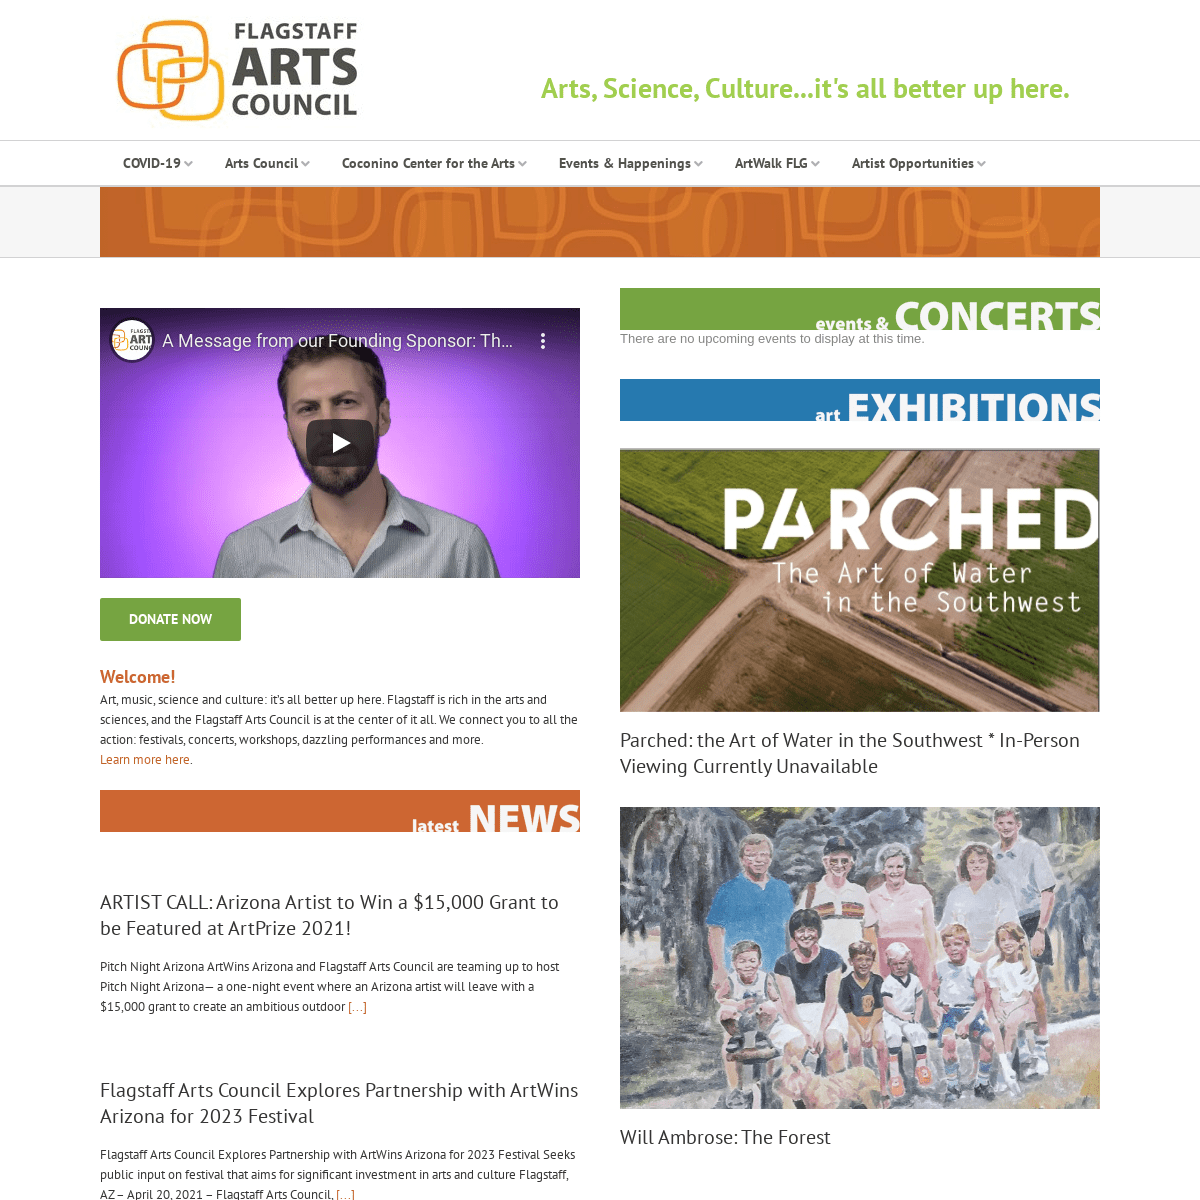 Home - Flagstaff Arts Council